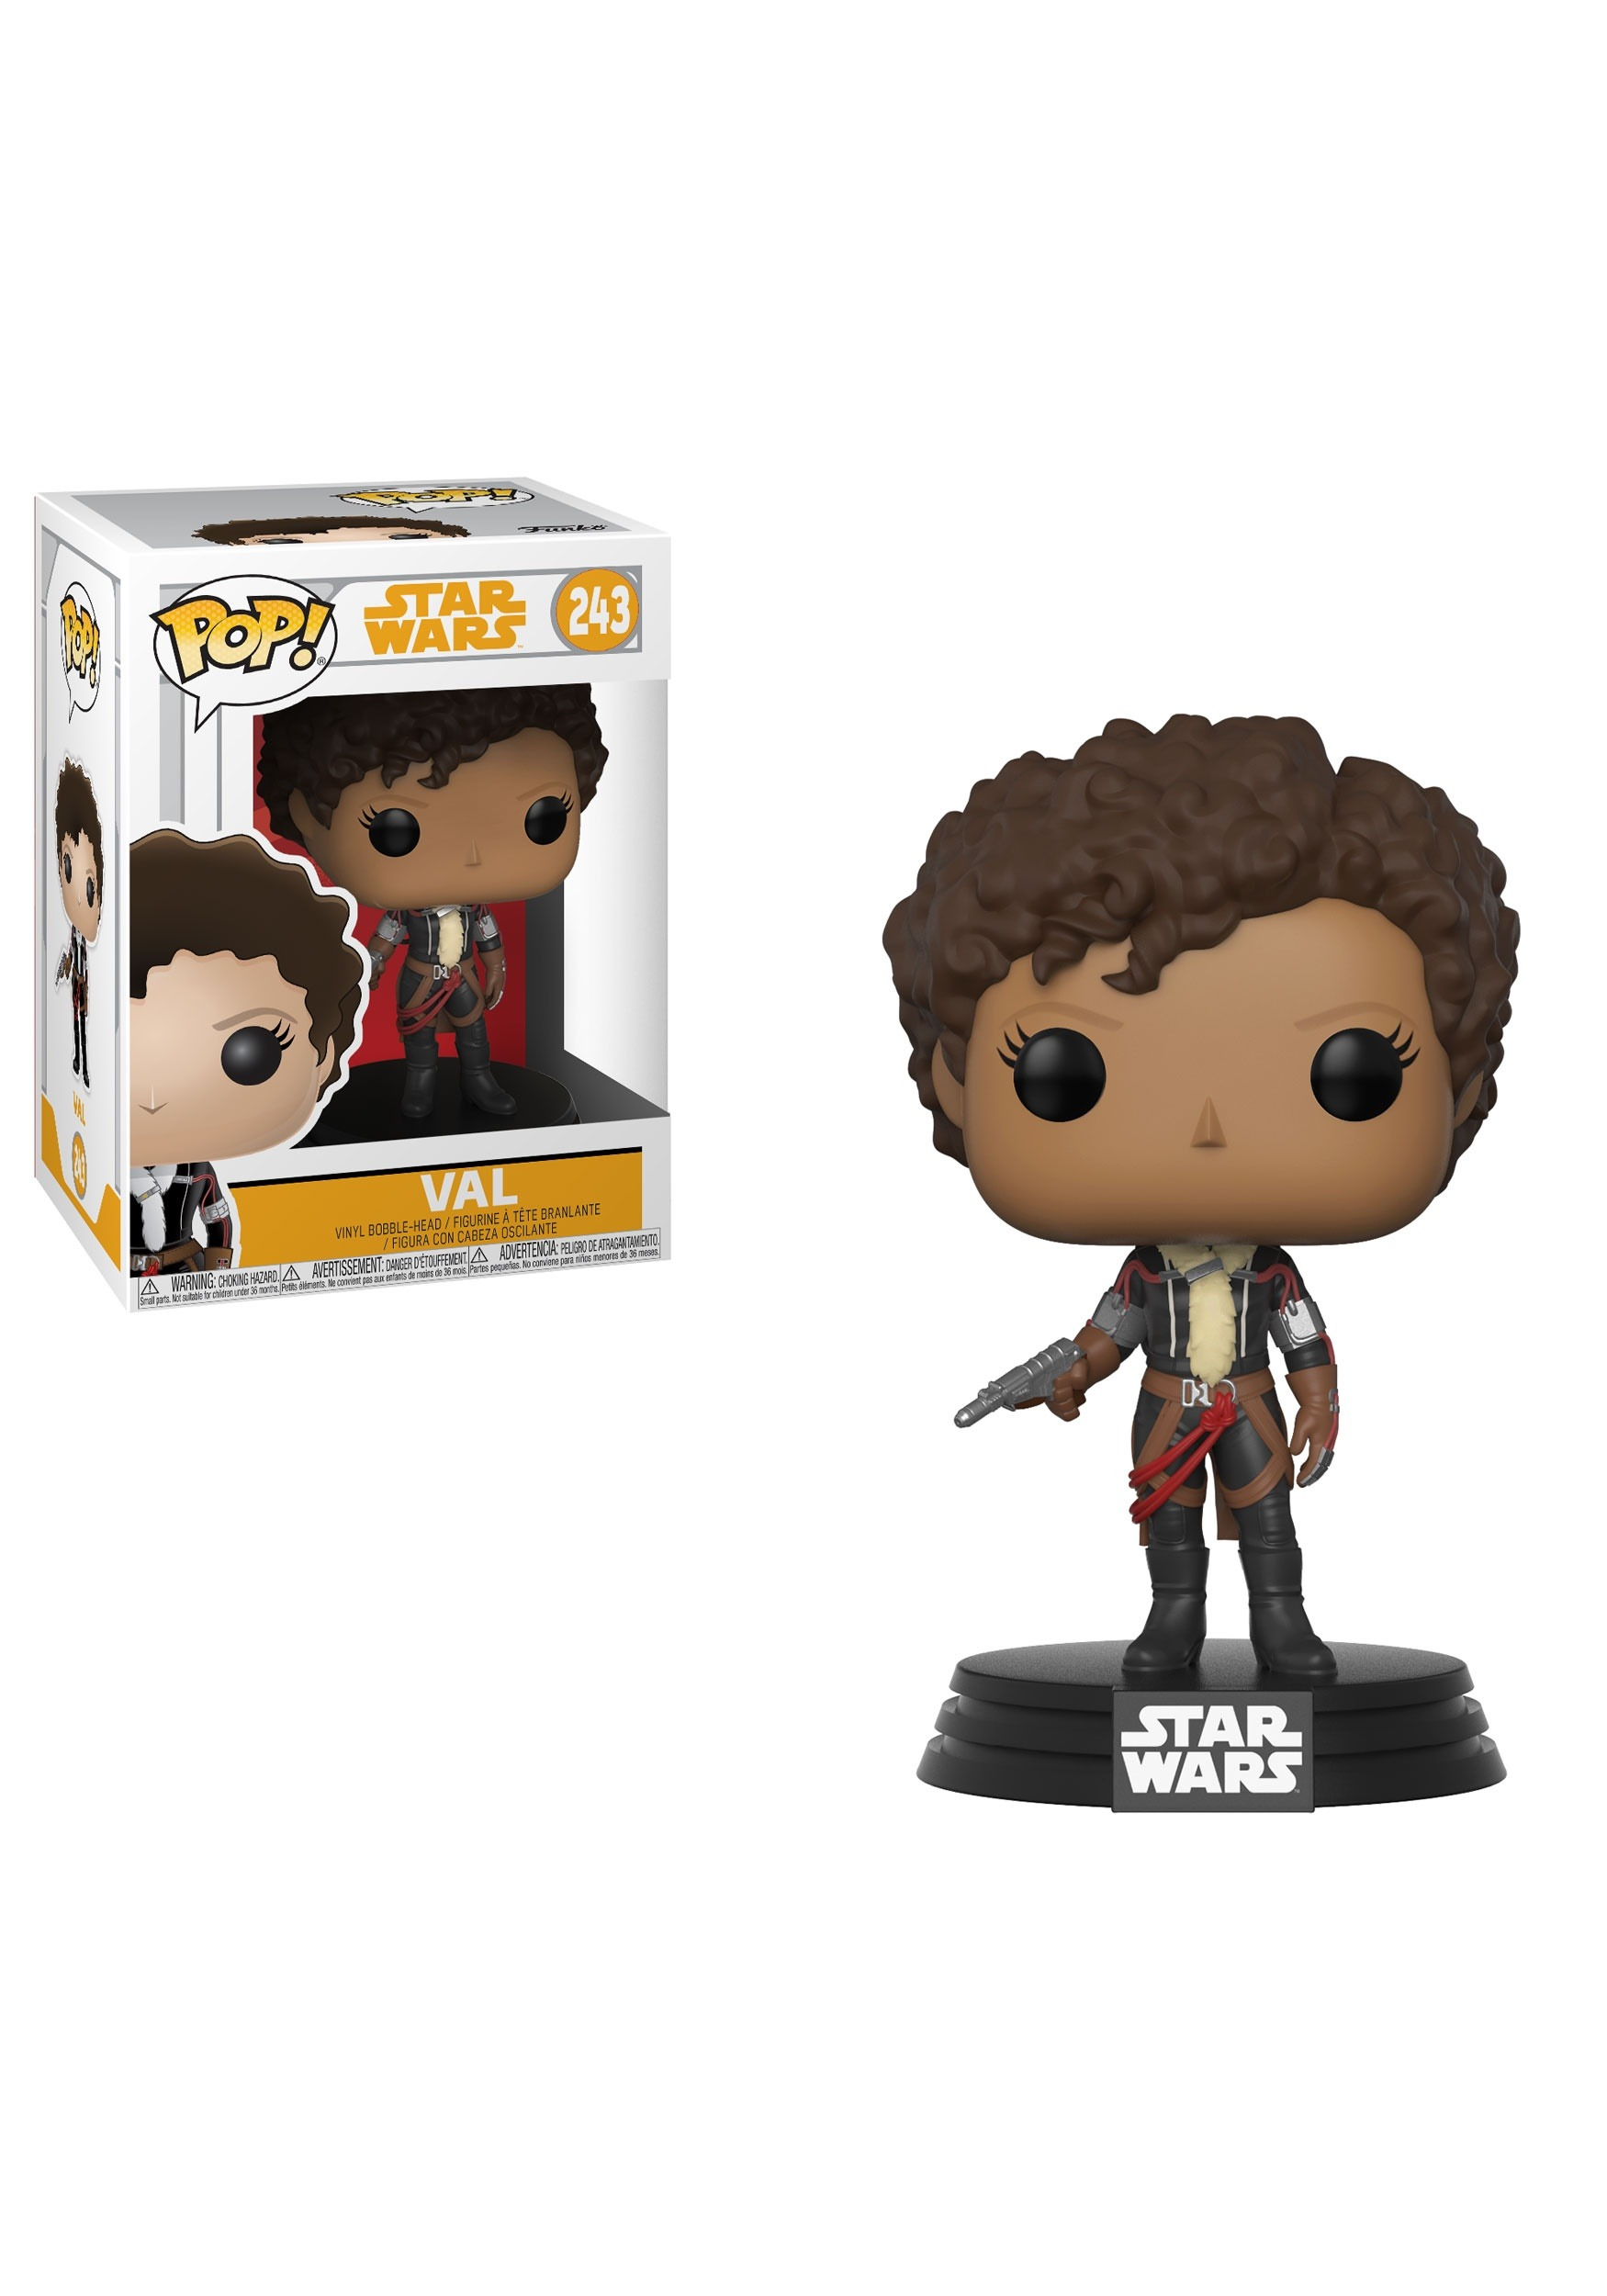 POP! Star Wars: Solo- Val Bobblehead Figure FN26989